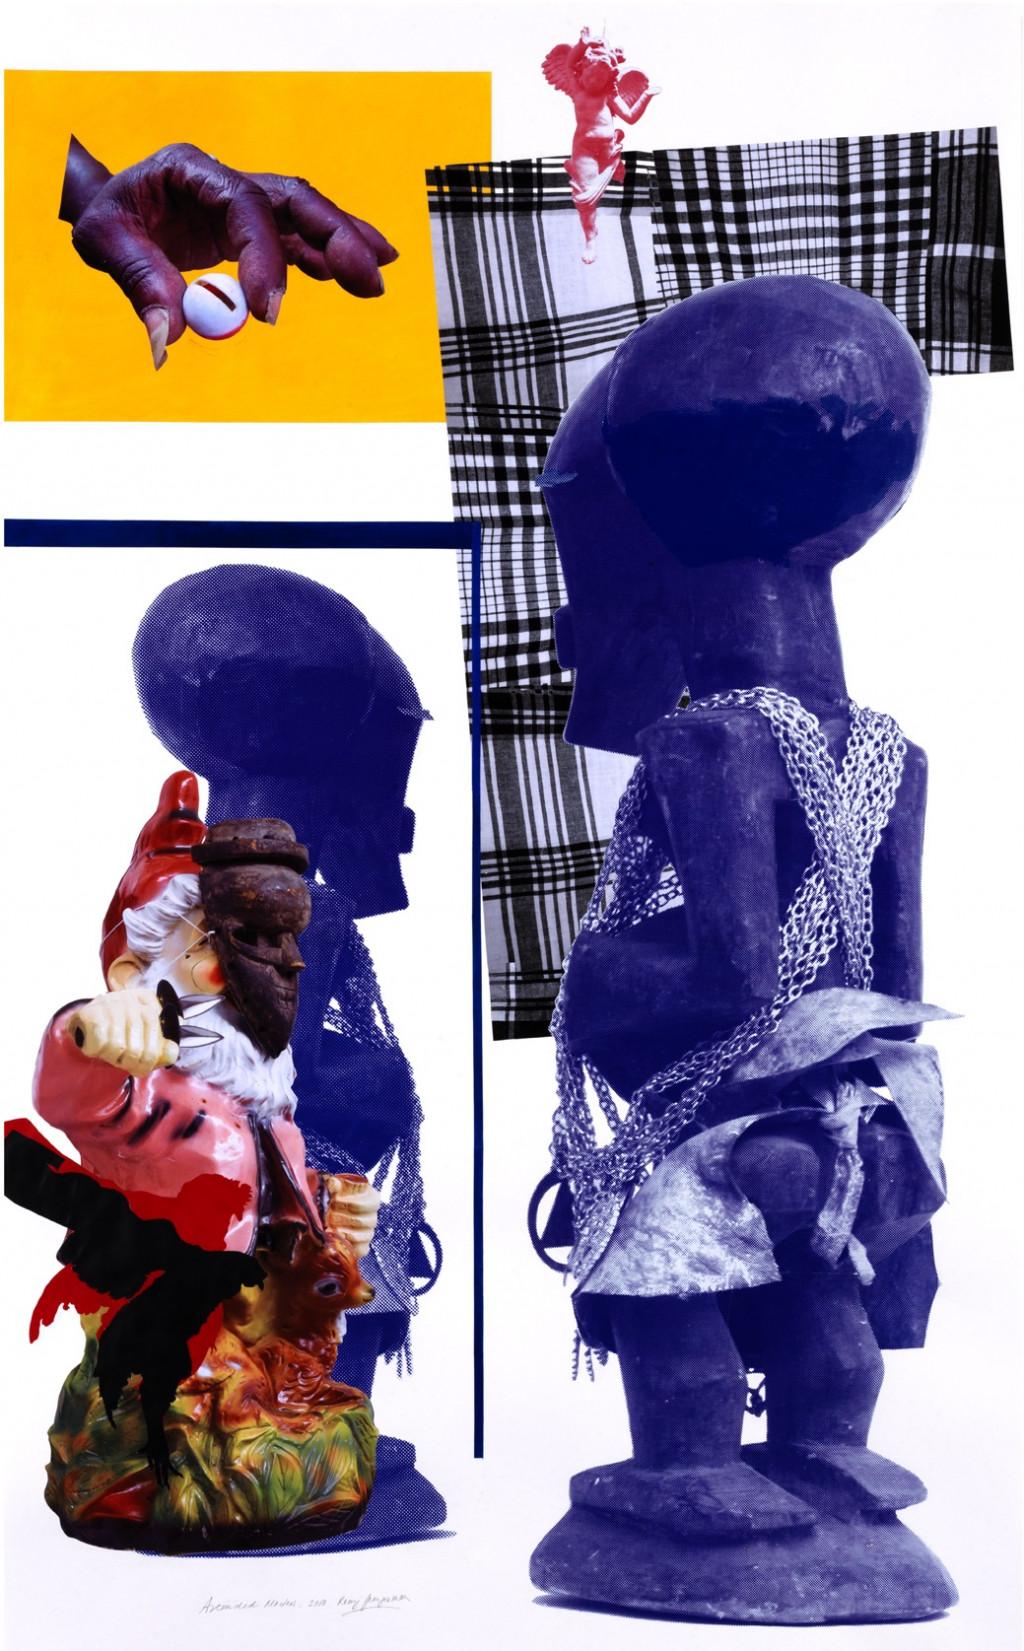 Remy Jungerman, ASCENDED MASTERS, collage, 199 x 121 cm, 2010. Courtesy van de kunstenaar en Galerie Ron Mandos. Fotografie Aatjan Renders